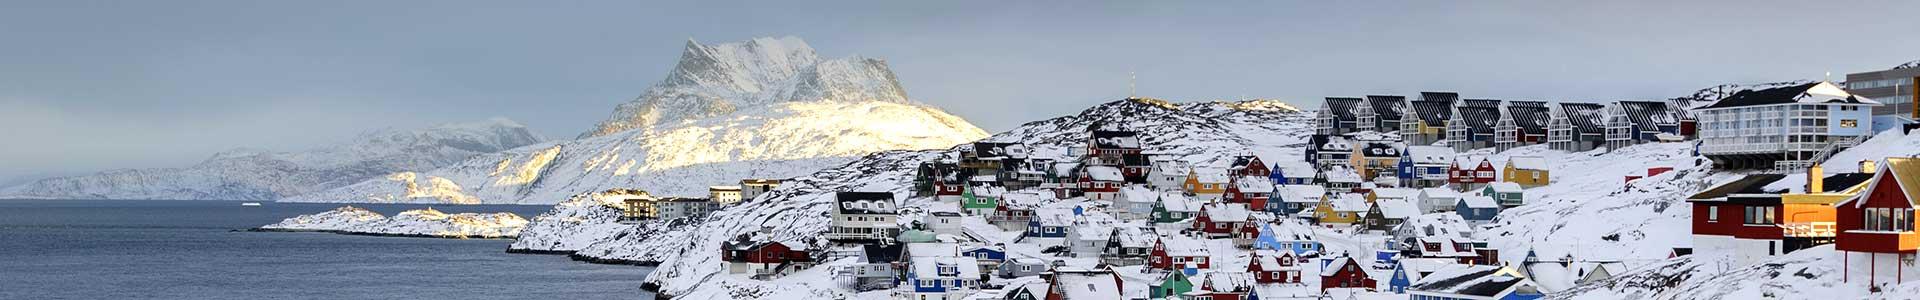 Voyage - Groenland - TUI